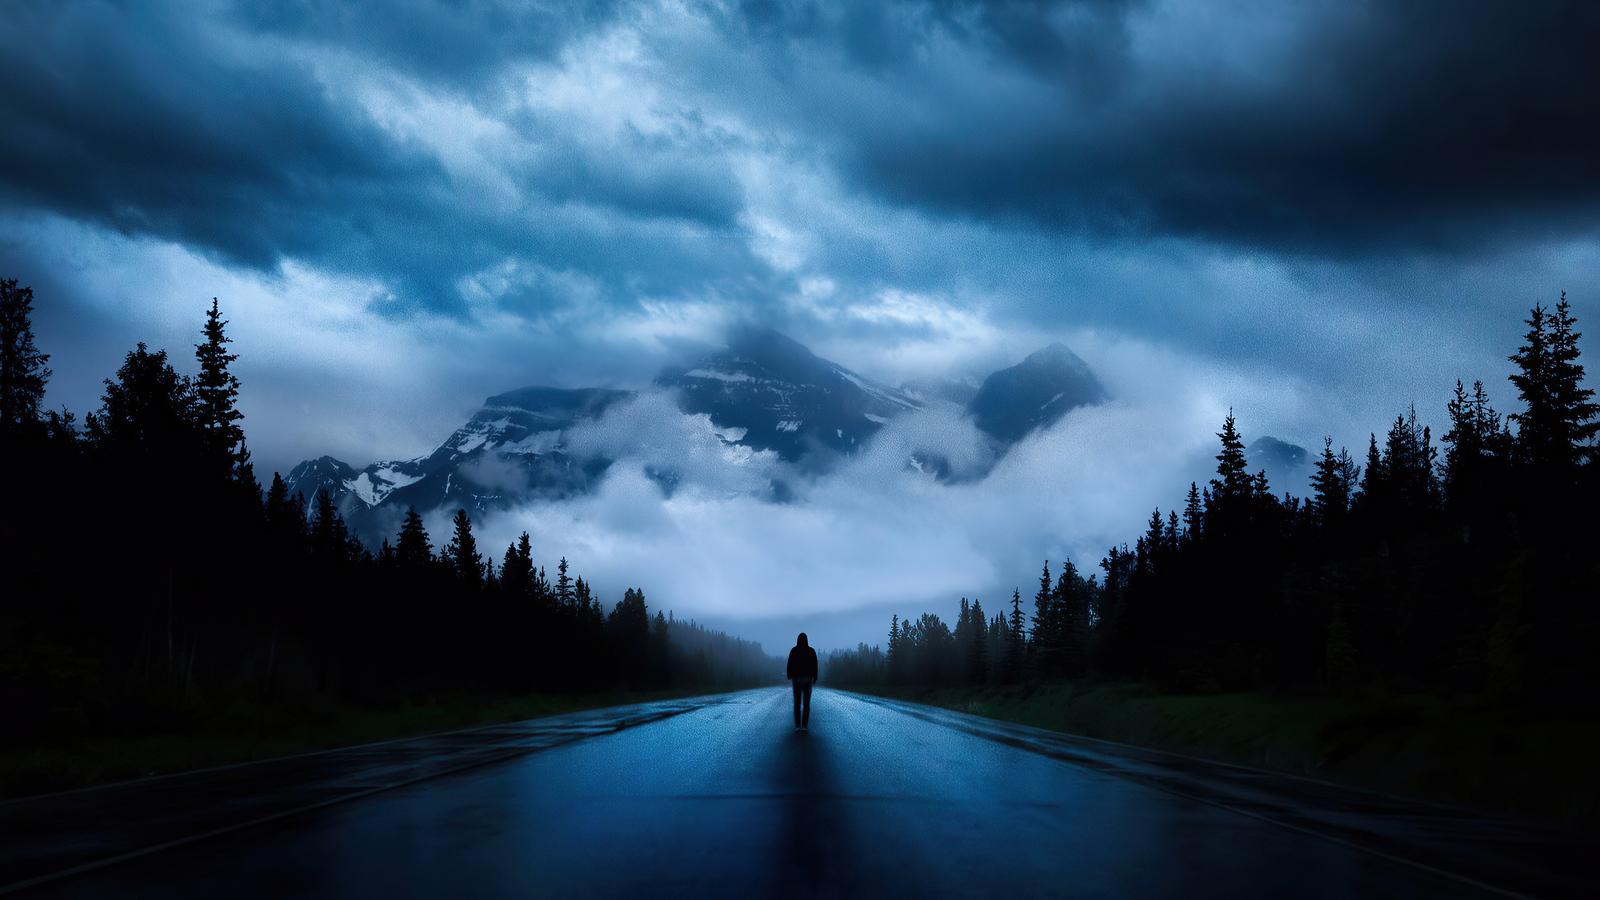 walking-alone-road-4k-qf.jpg